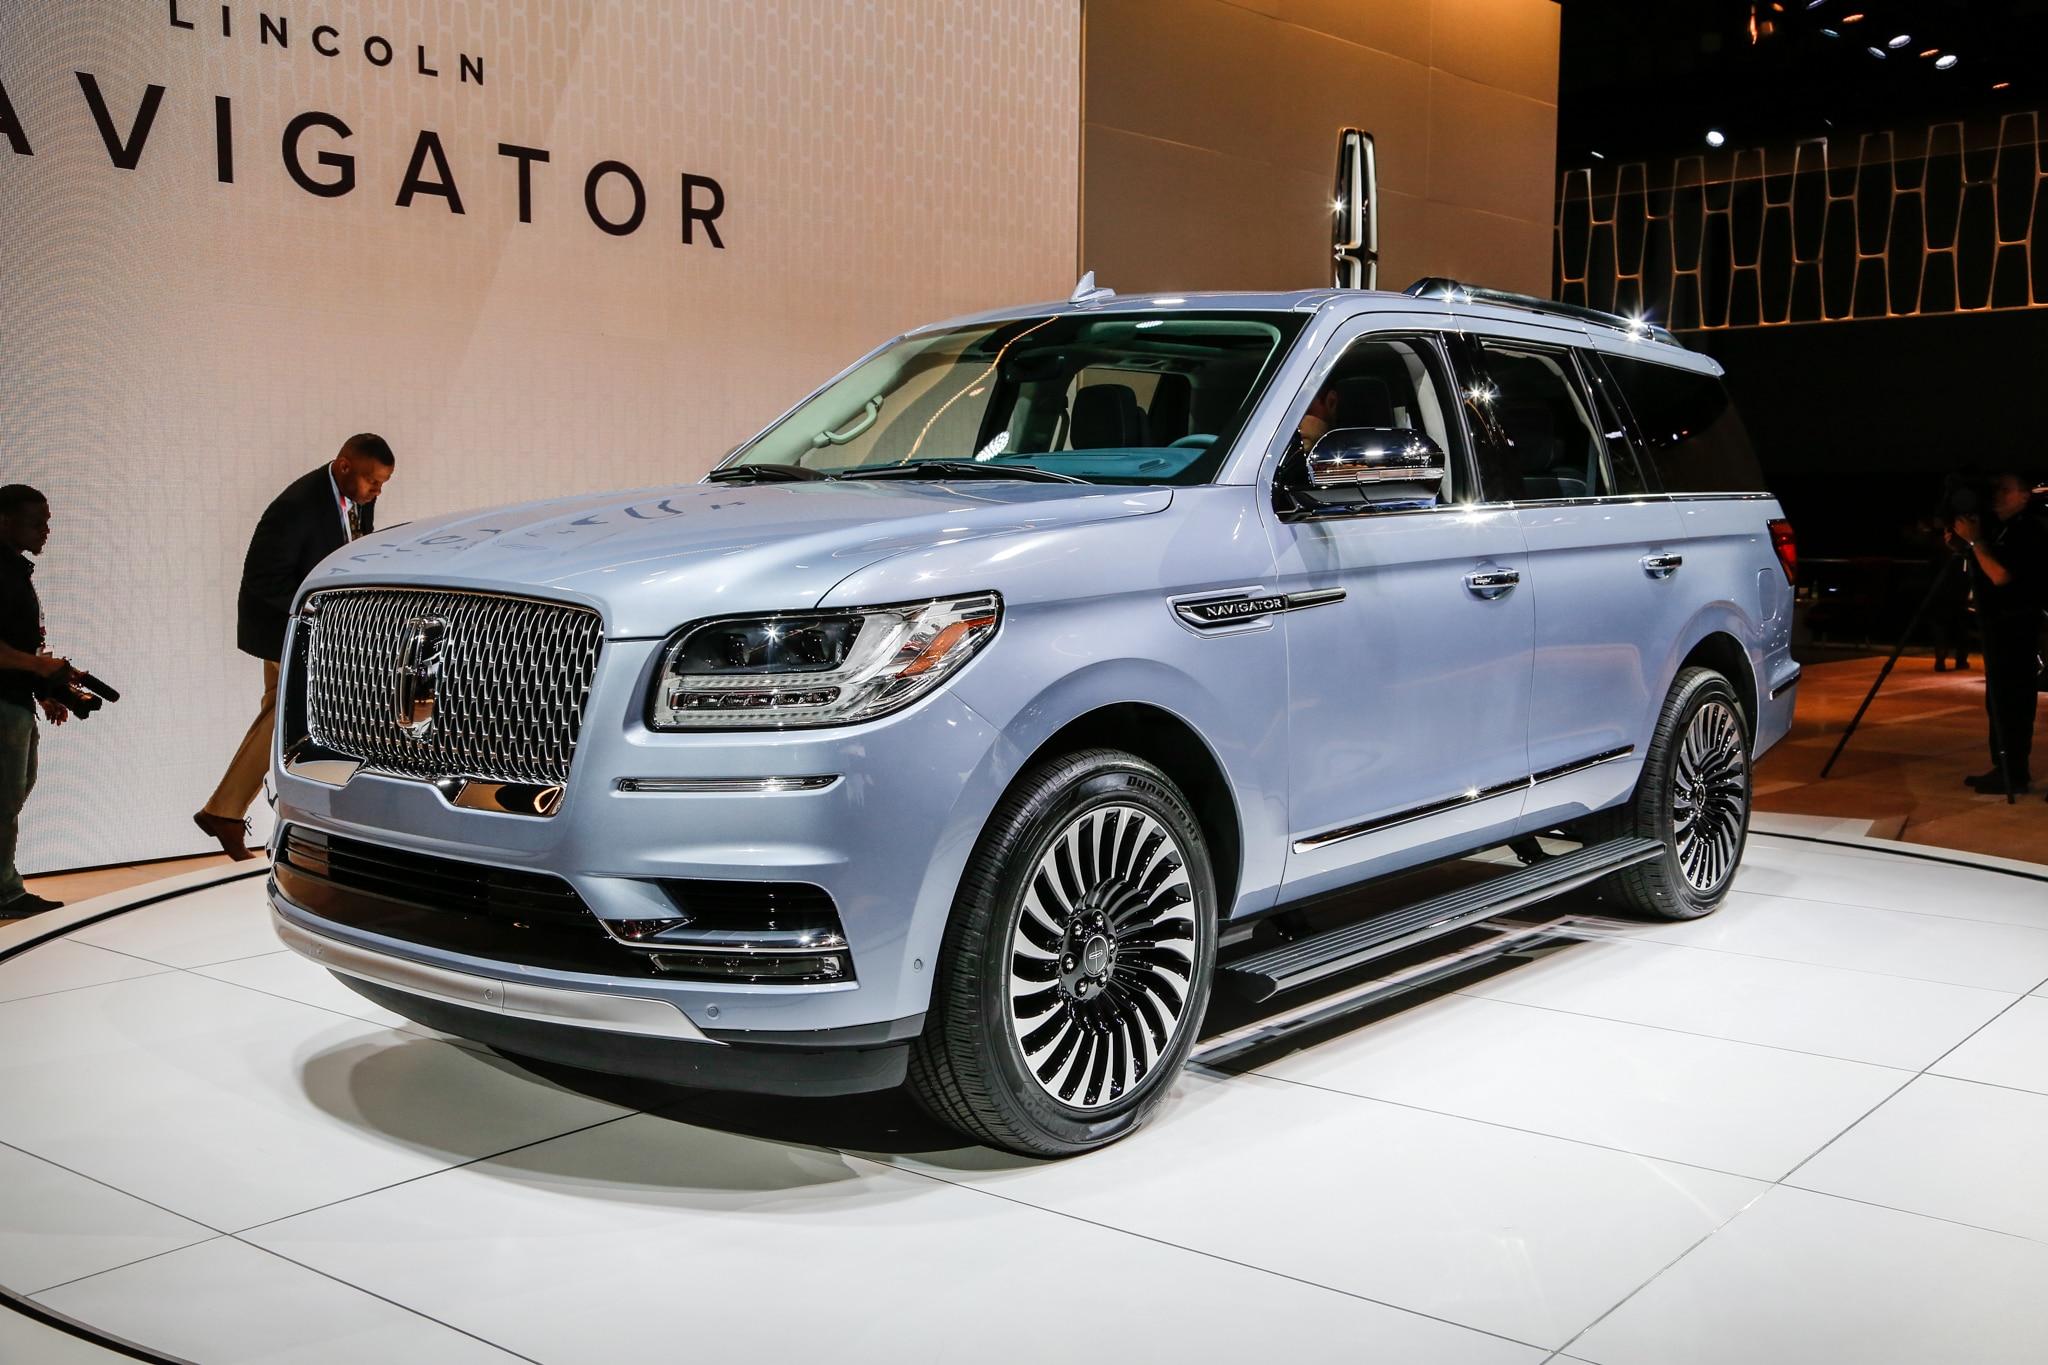 Lincoln lincoln navigator new york auto show 2018 lincoln navigator - Show More